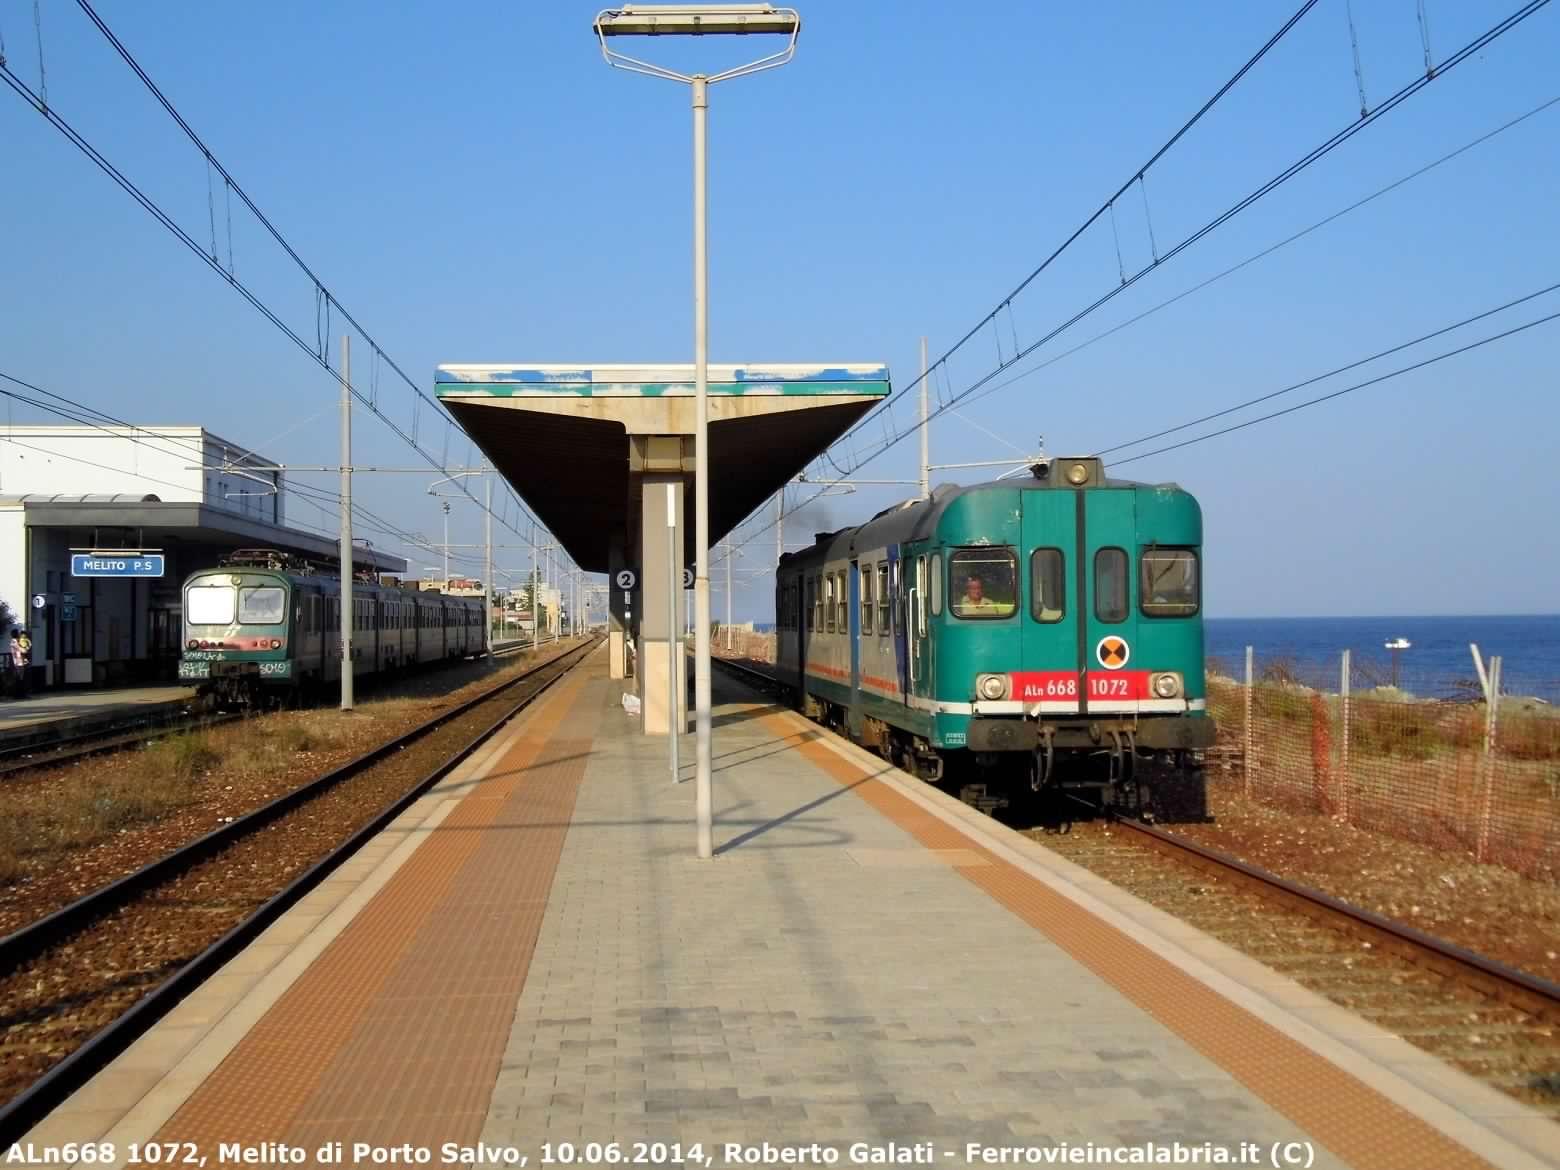 ALn668 1052-Reg3749-Melito di Porto Salvo-2014-06-08-RobertoGalati